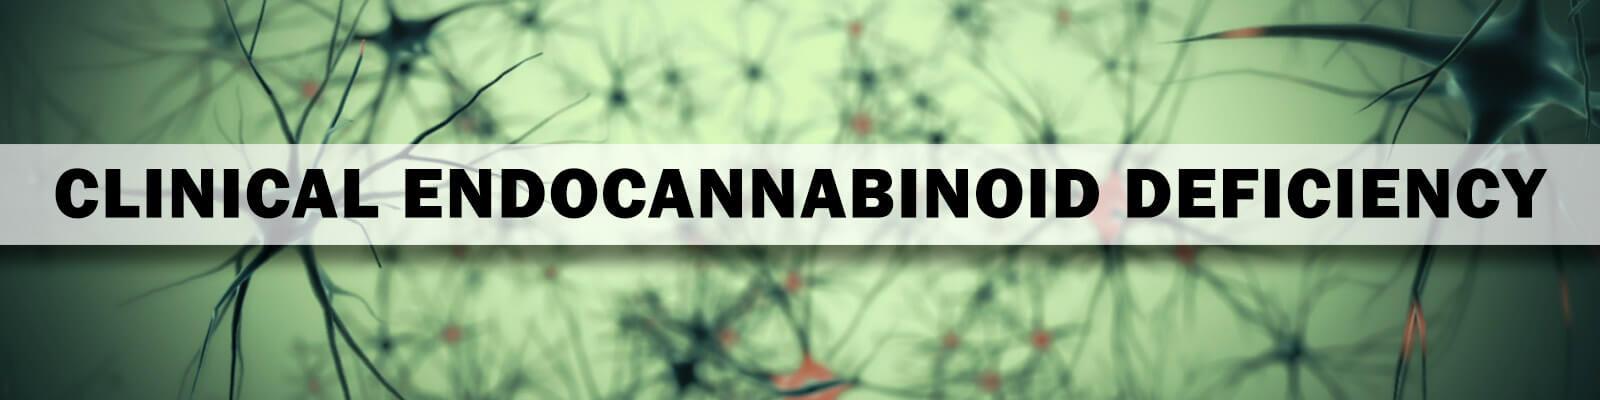 clinical endocannabinoid deficiency banner